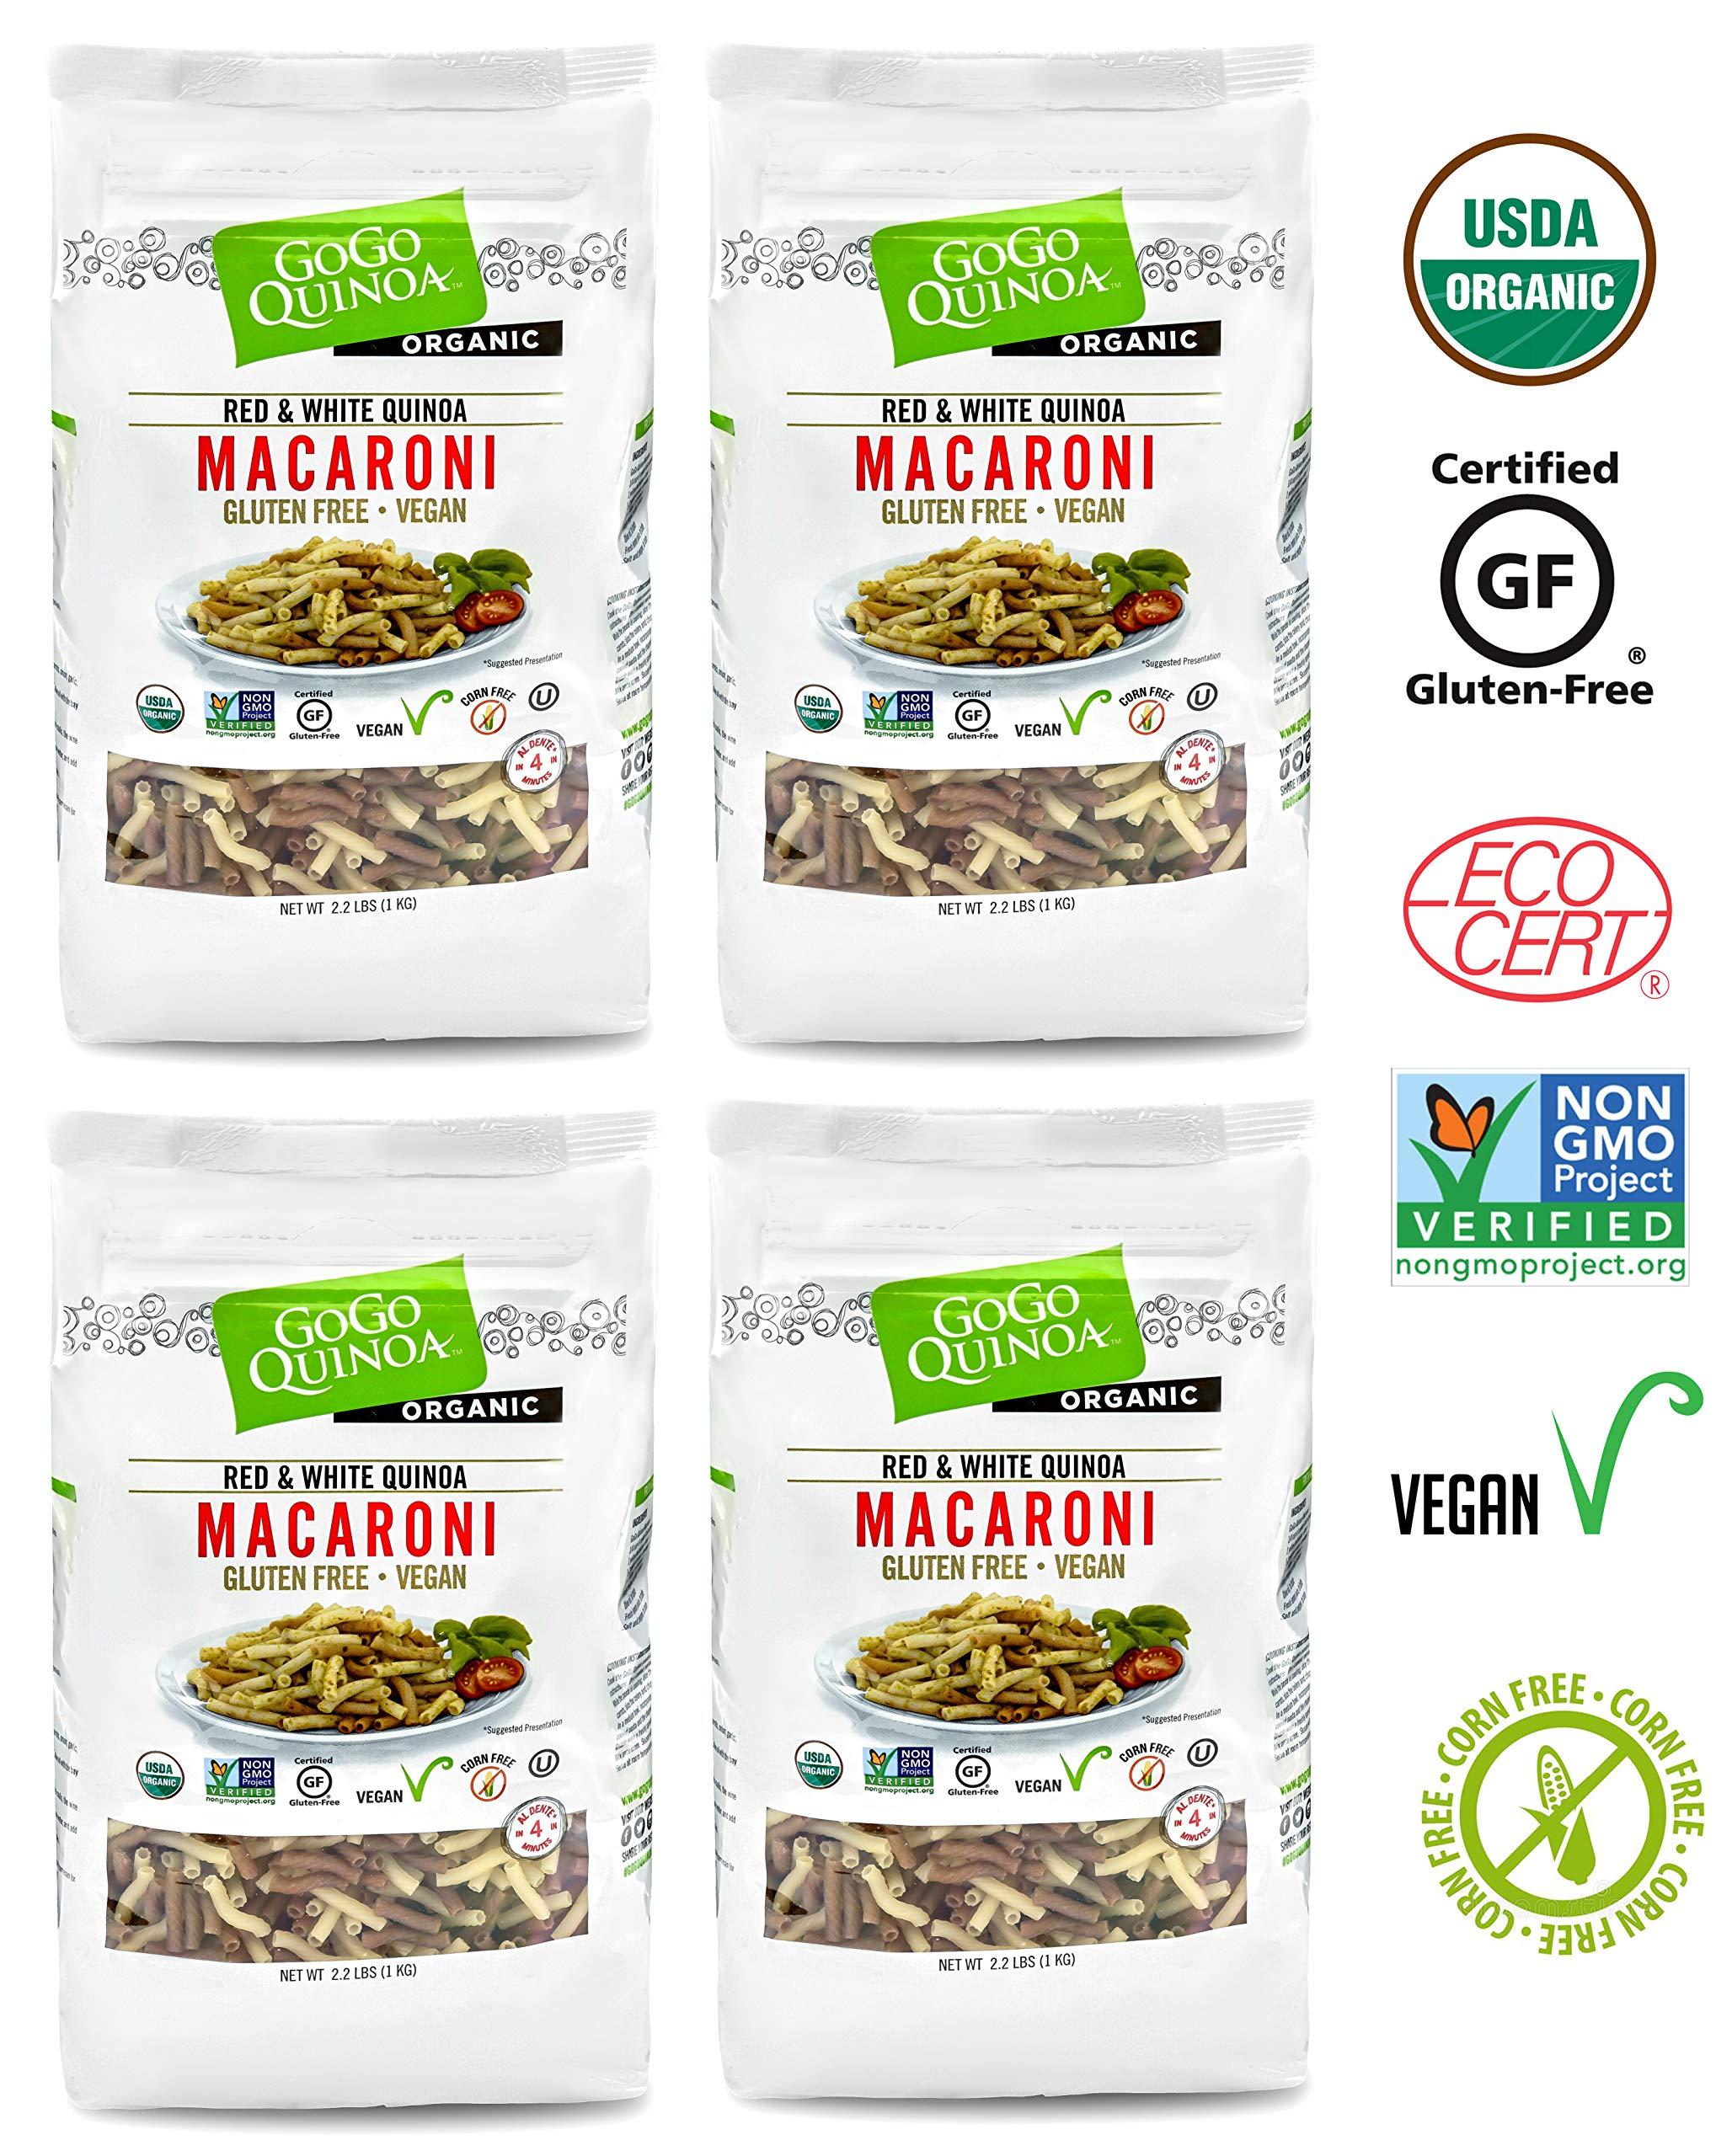 GoGo Quinoa Organic Premium Quality Vegan Red and White Macaroni Pasta, Non-GMO Project Verified & Kosher Certified 8.8 Lbs by GoGo Quinoa